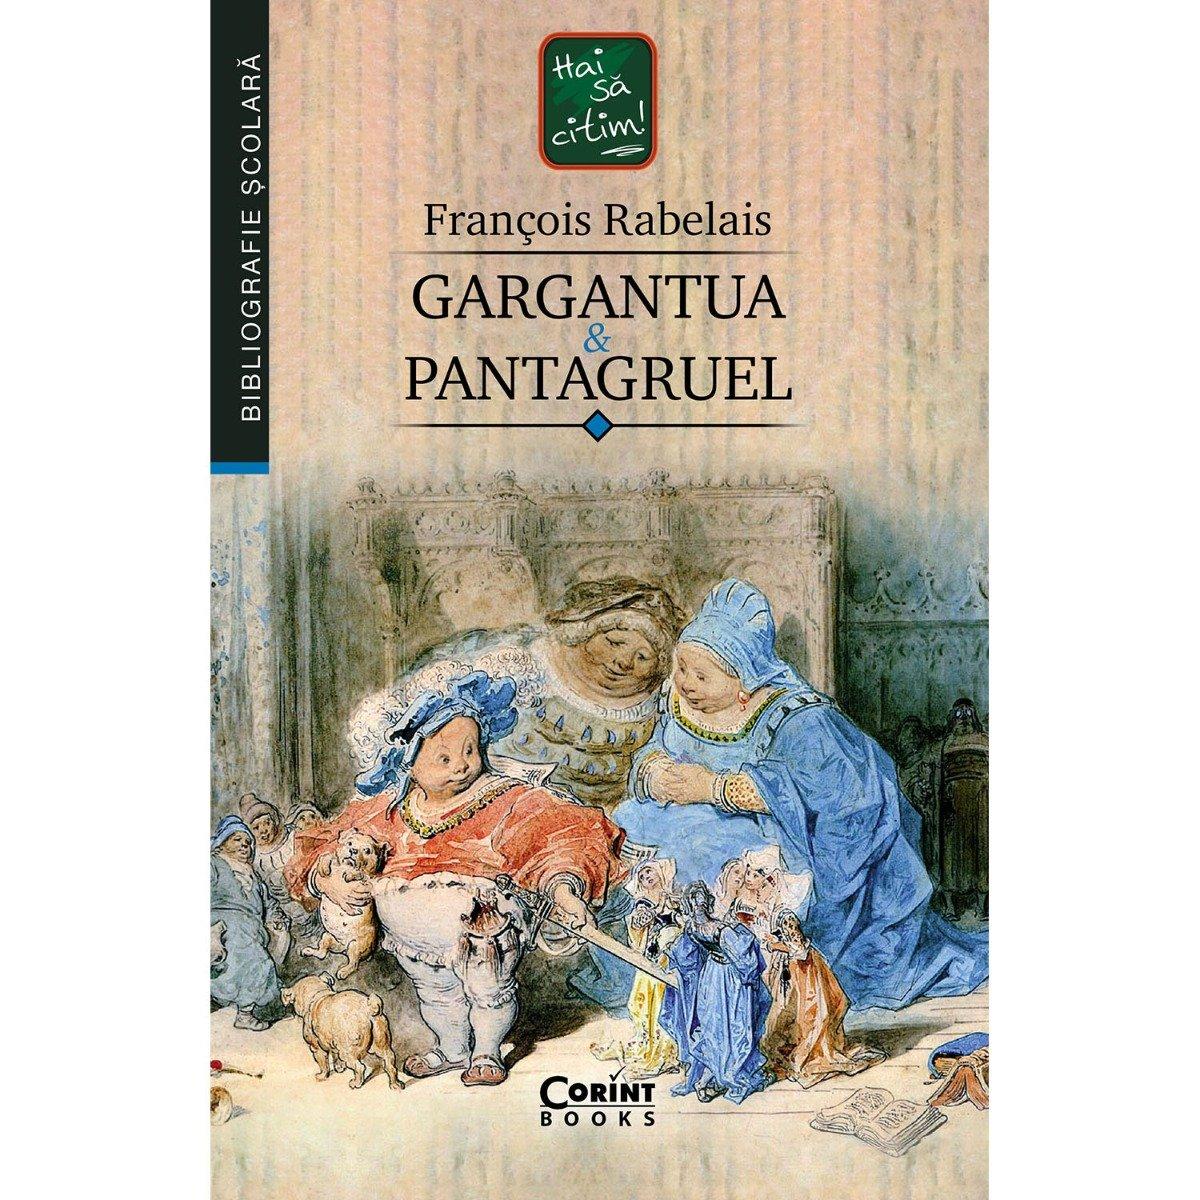 Carte Editura Corint, Gargantua si Pantagruel, Francois Rabelais